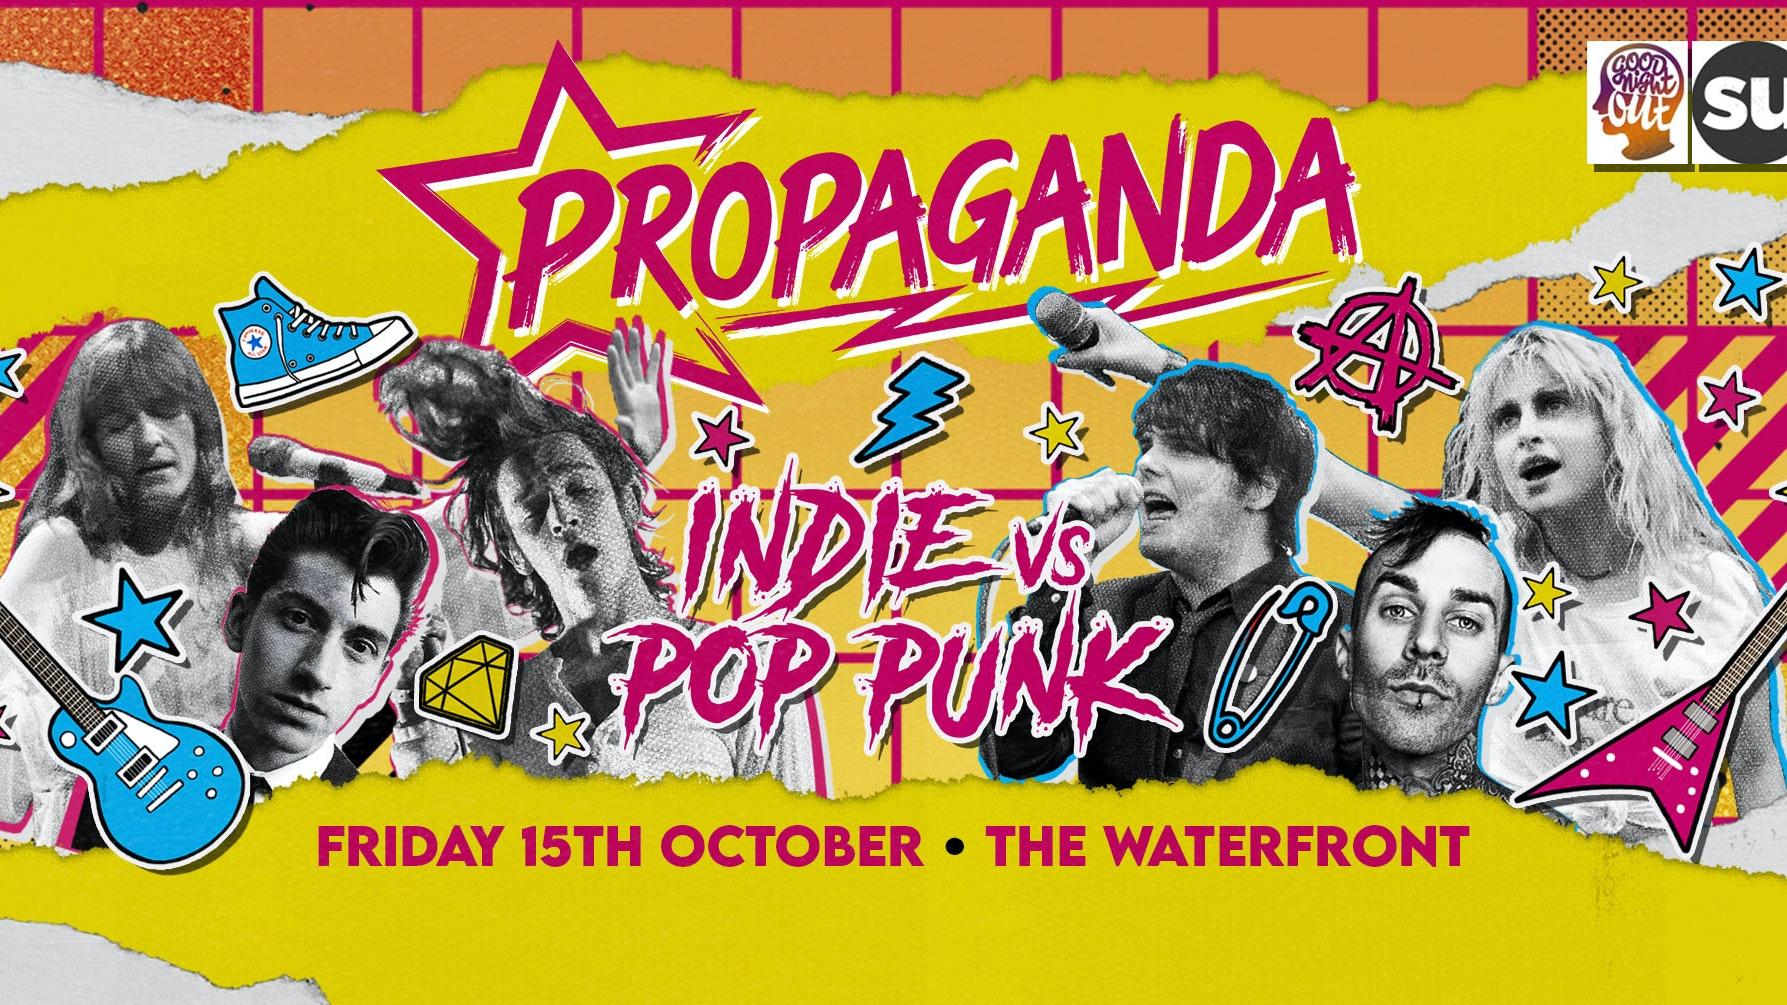 Propaganda Norwich – Indie vs Pop-Punk Party!